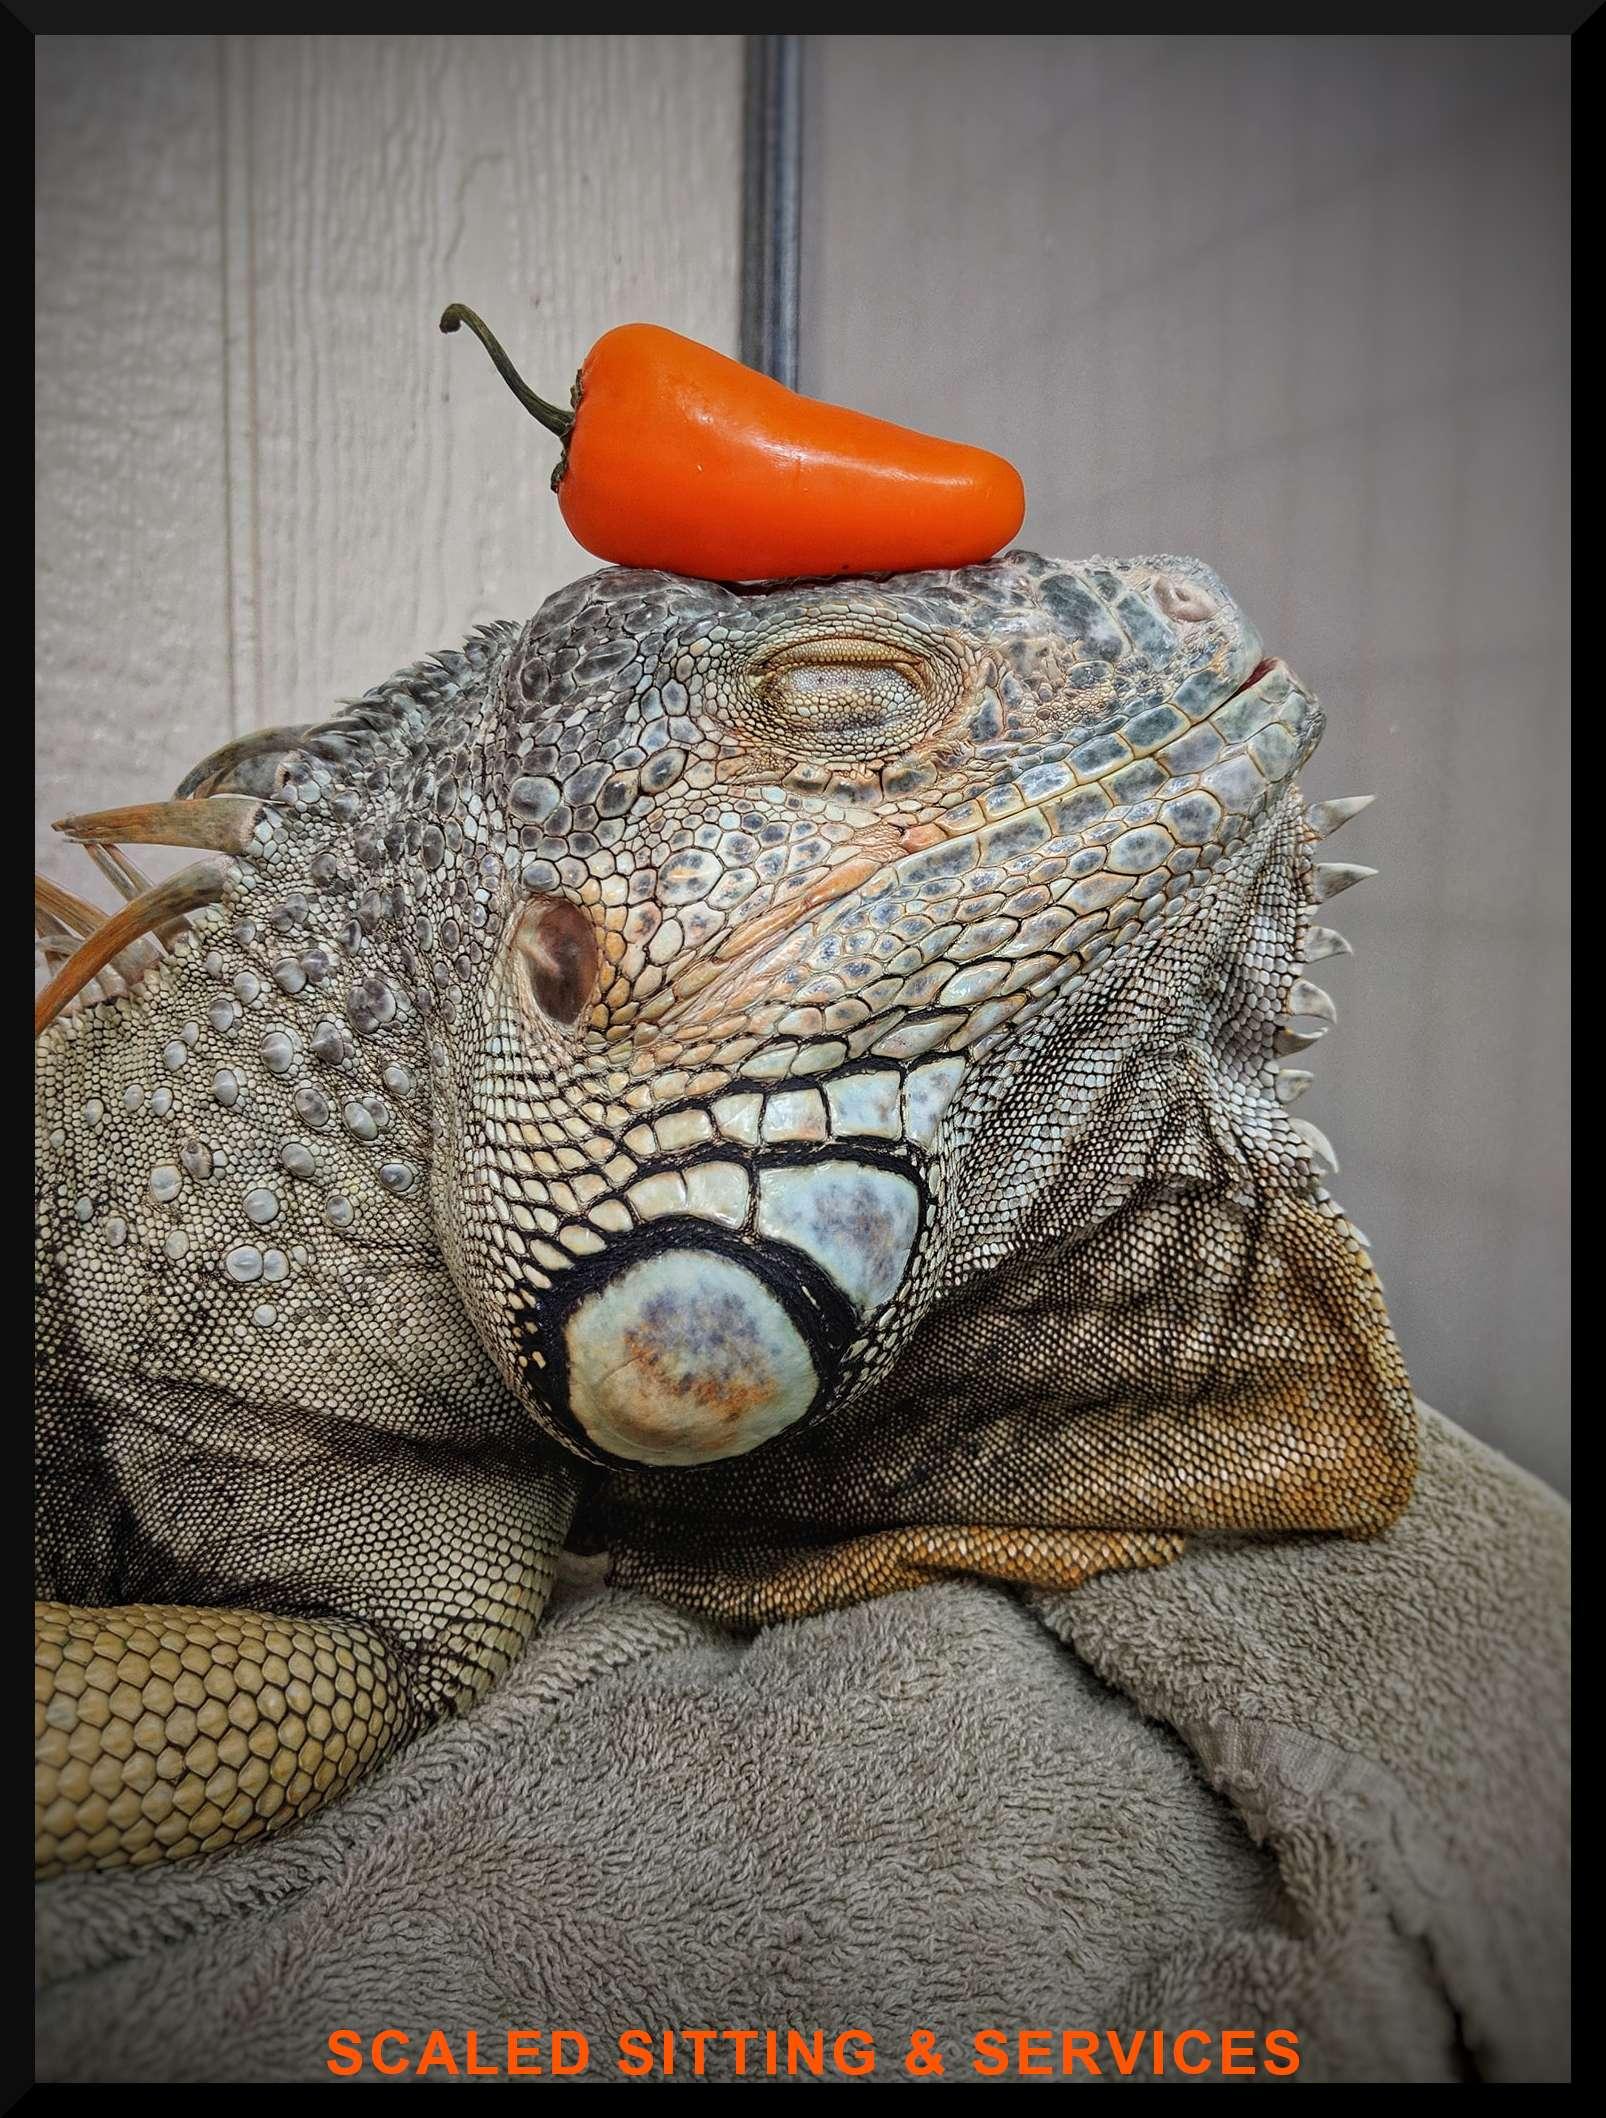 green iguana head side angle, single orange sweet pepper is resting on iguanas head